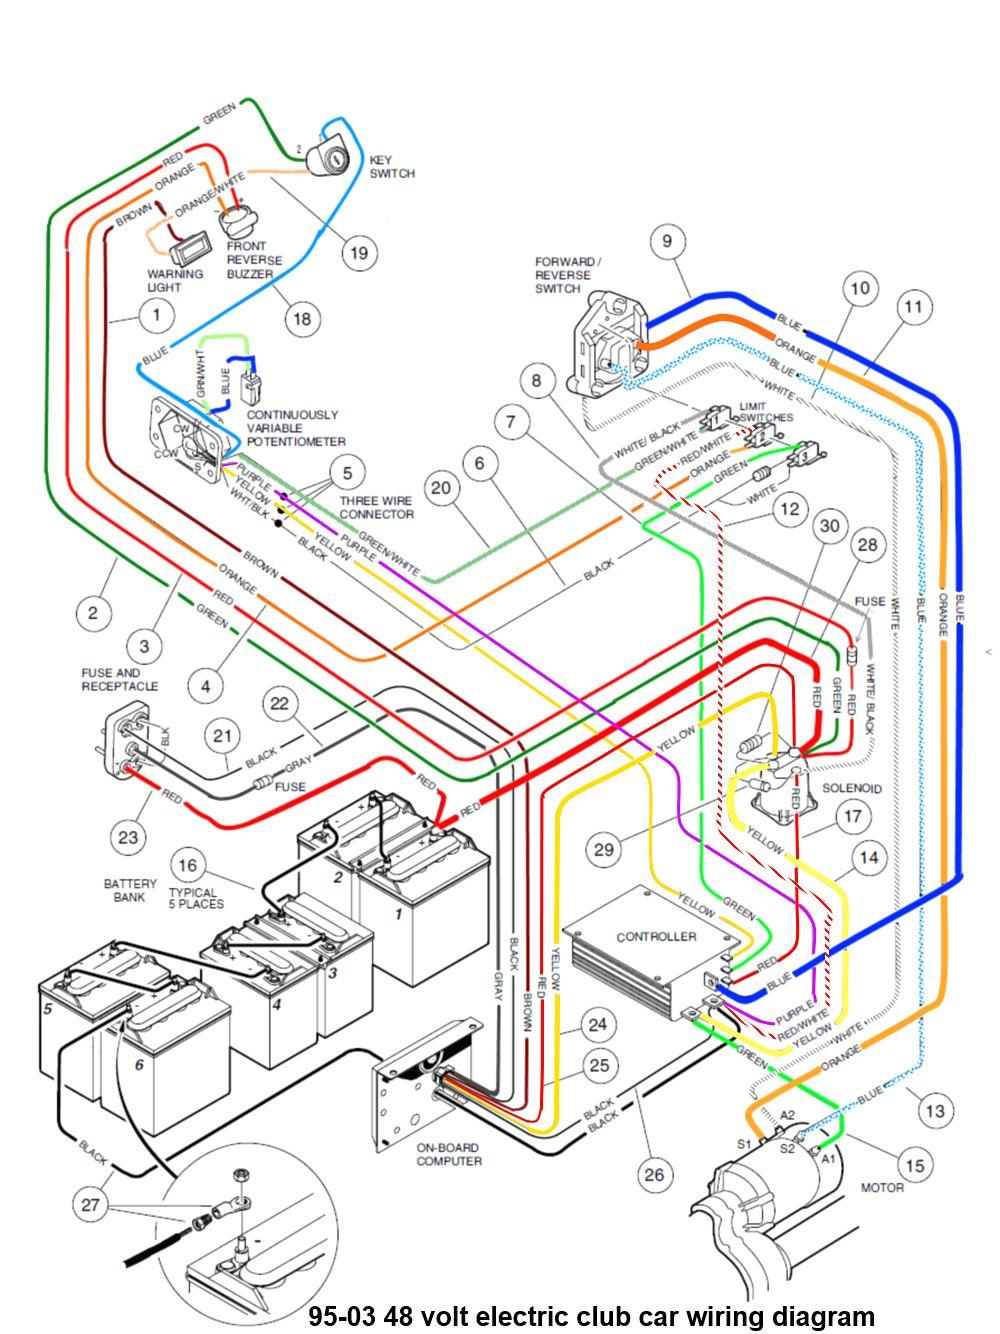 24 Simple Free Wiring Diagram Software Design , https